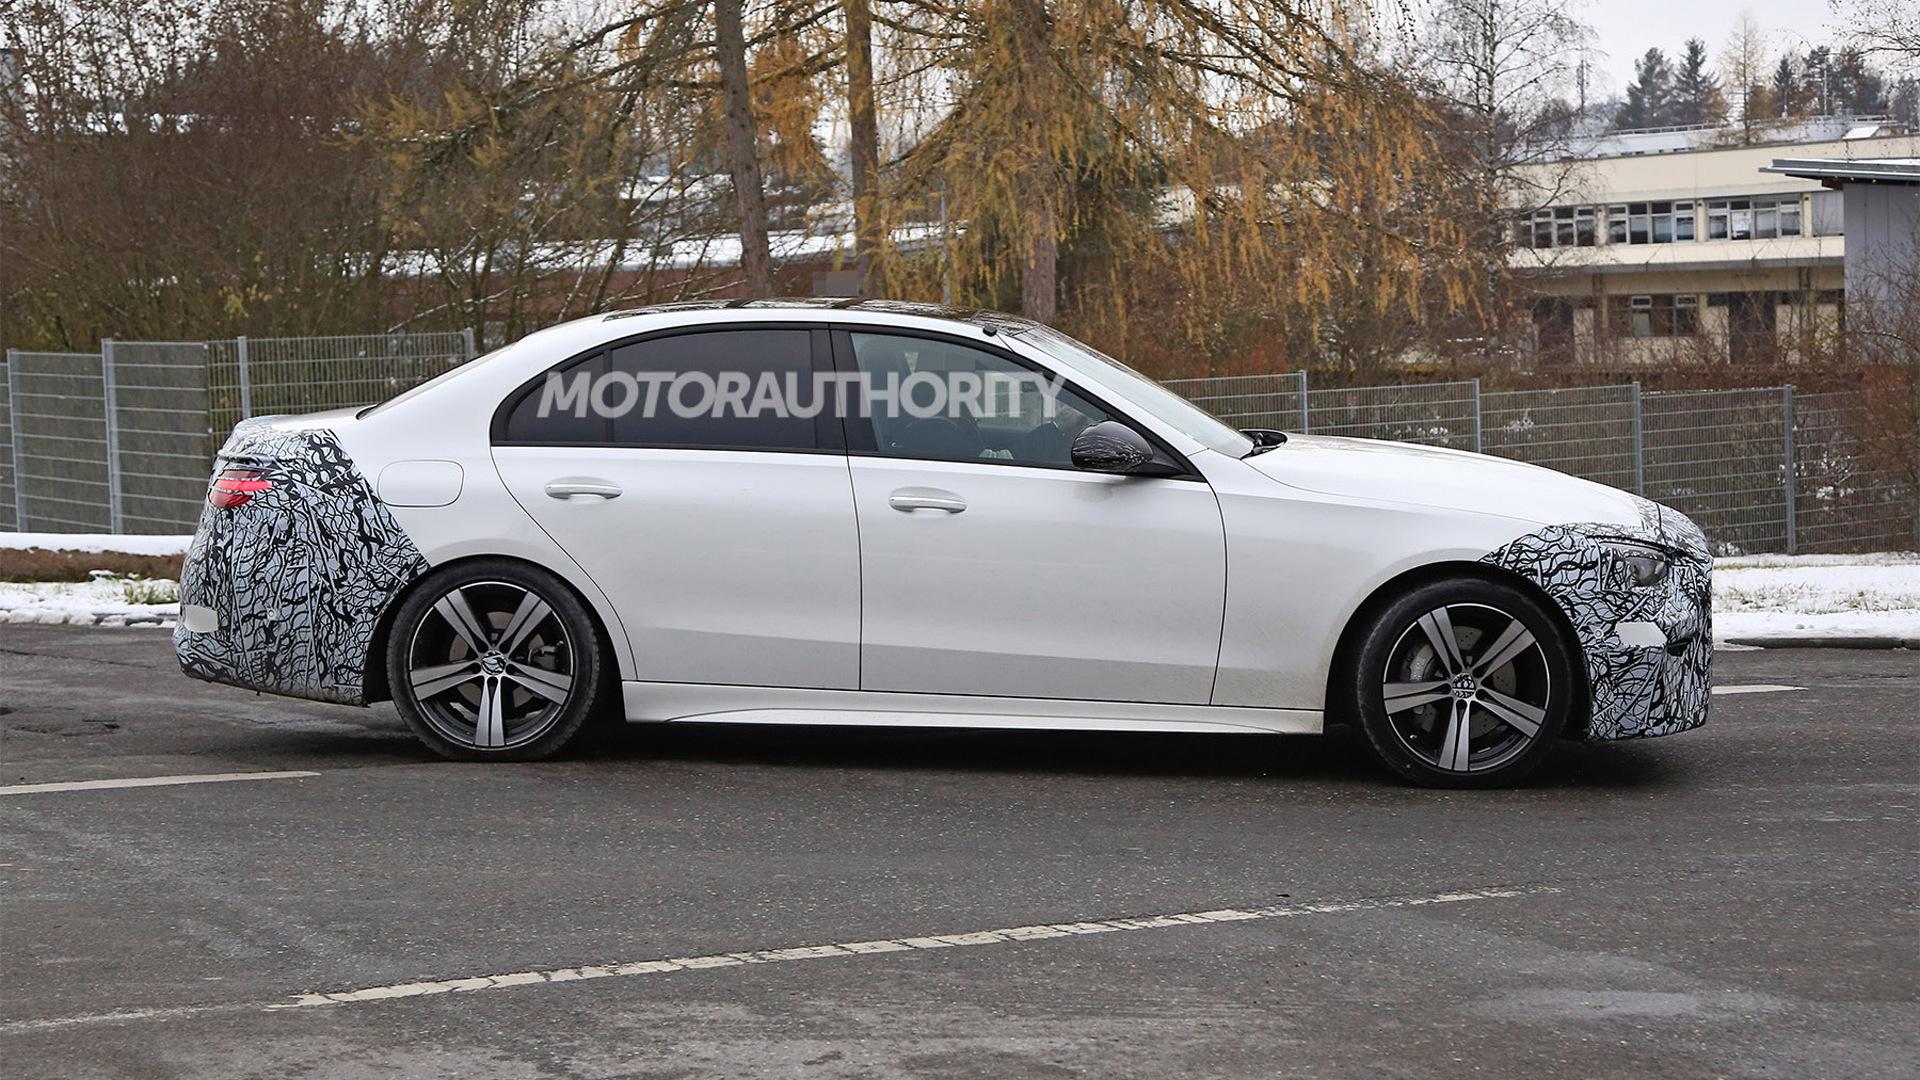 2022 Mercedes-Benz C-Class spy shots - Photo credit: S. Baldauf/SB-Medien